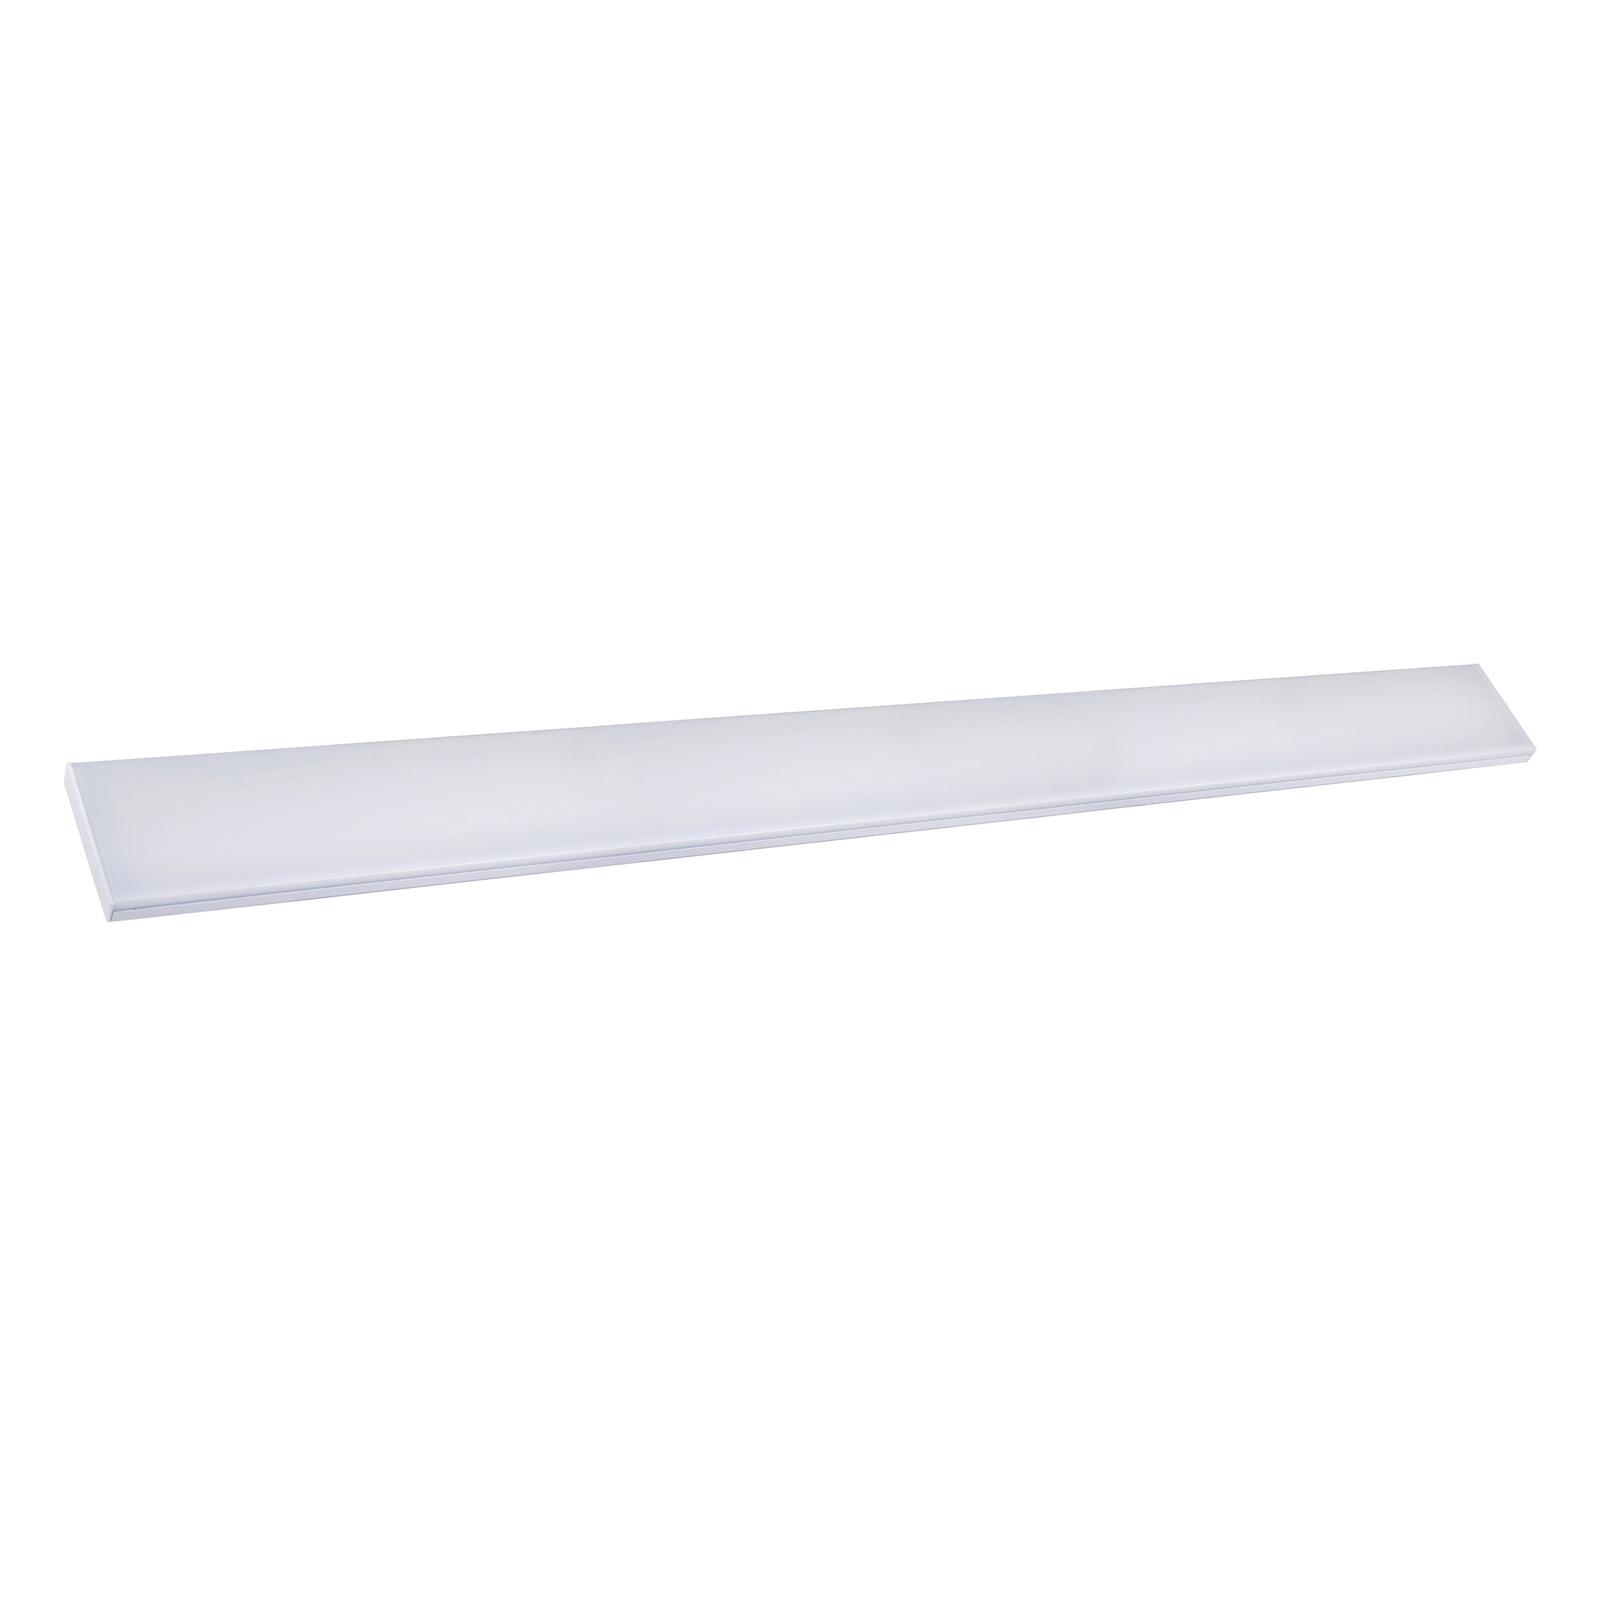 LED plafondlamp Planus 120 universeel wit